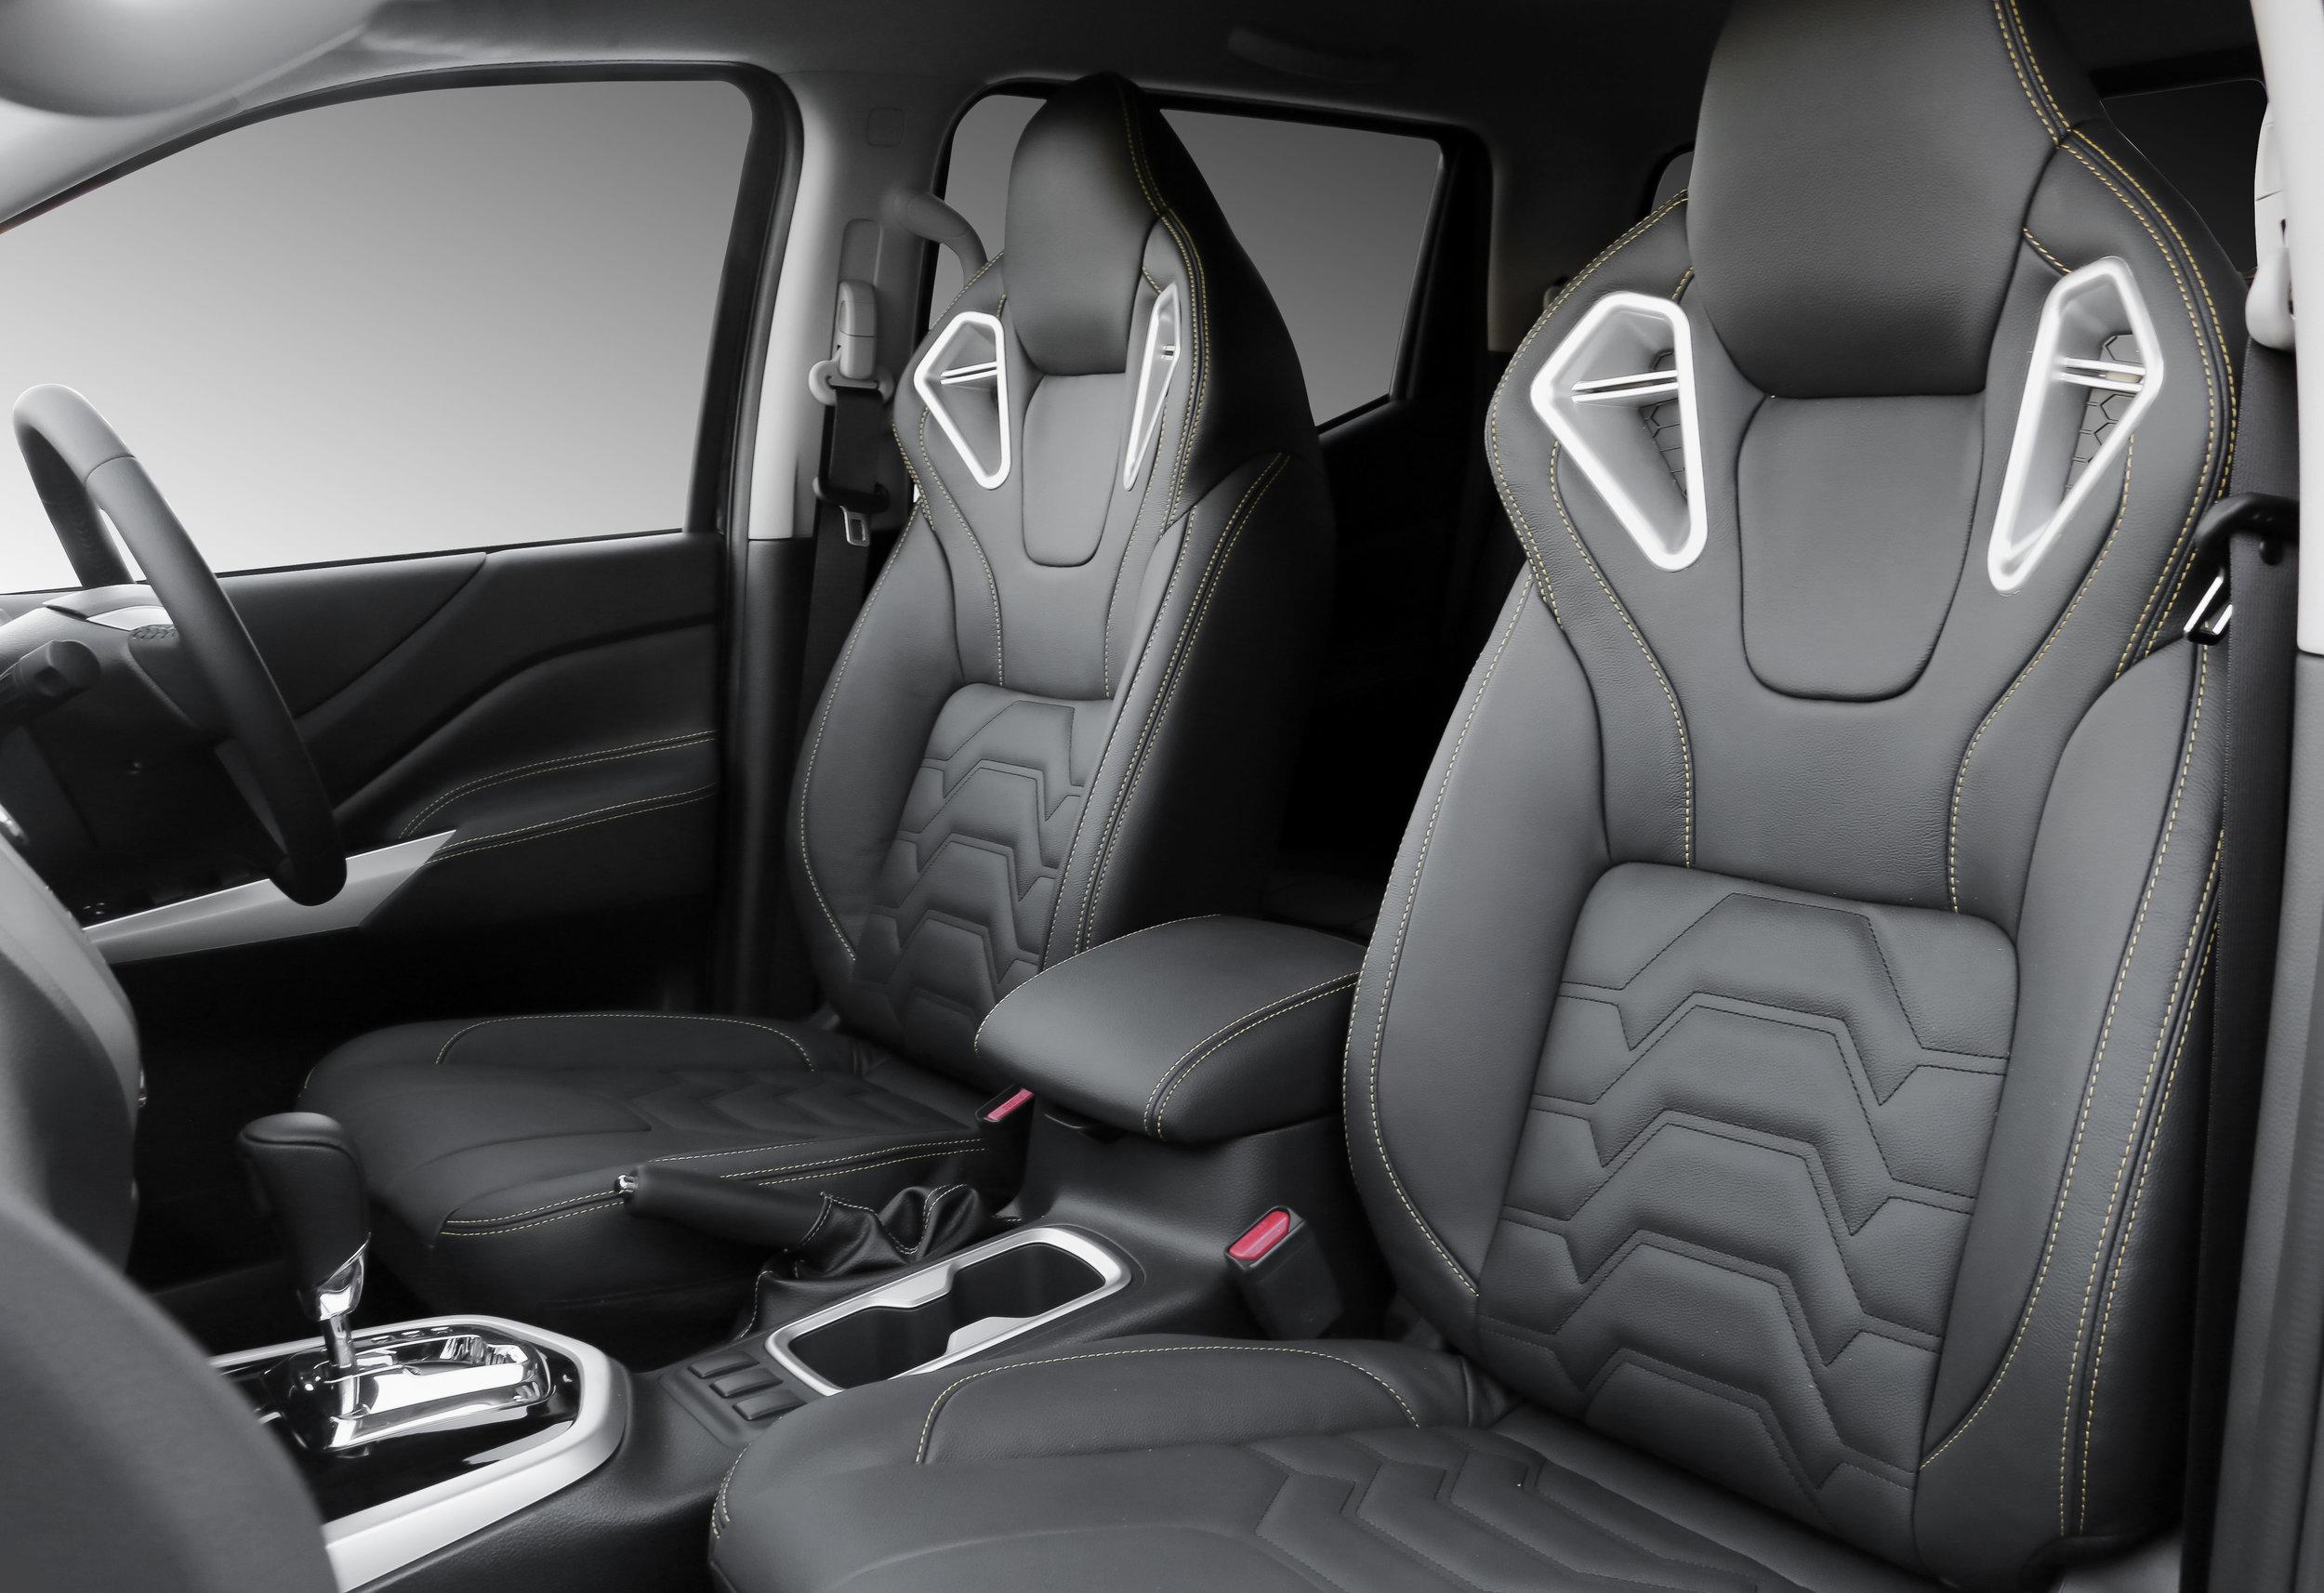 RVE-Nissan-Navara-Sport-Leather-Upgrade-Monza-Design-Armour-Front-Back-Row-1.jpg